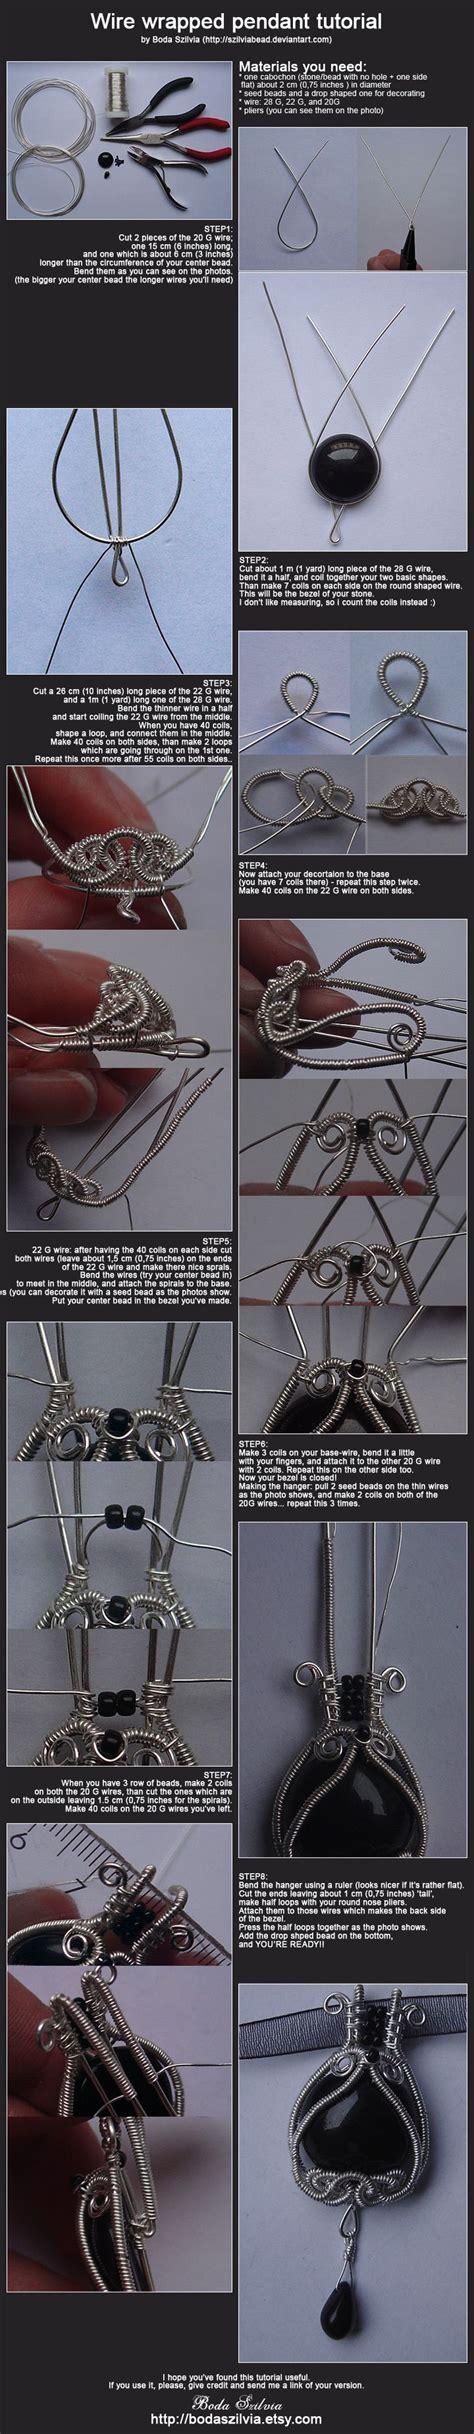 wire tutorial wire wrapped pendant tutorial handmade jewelry